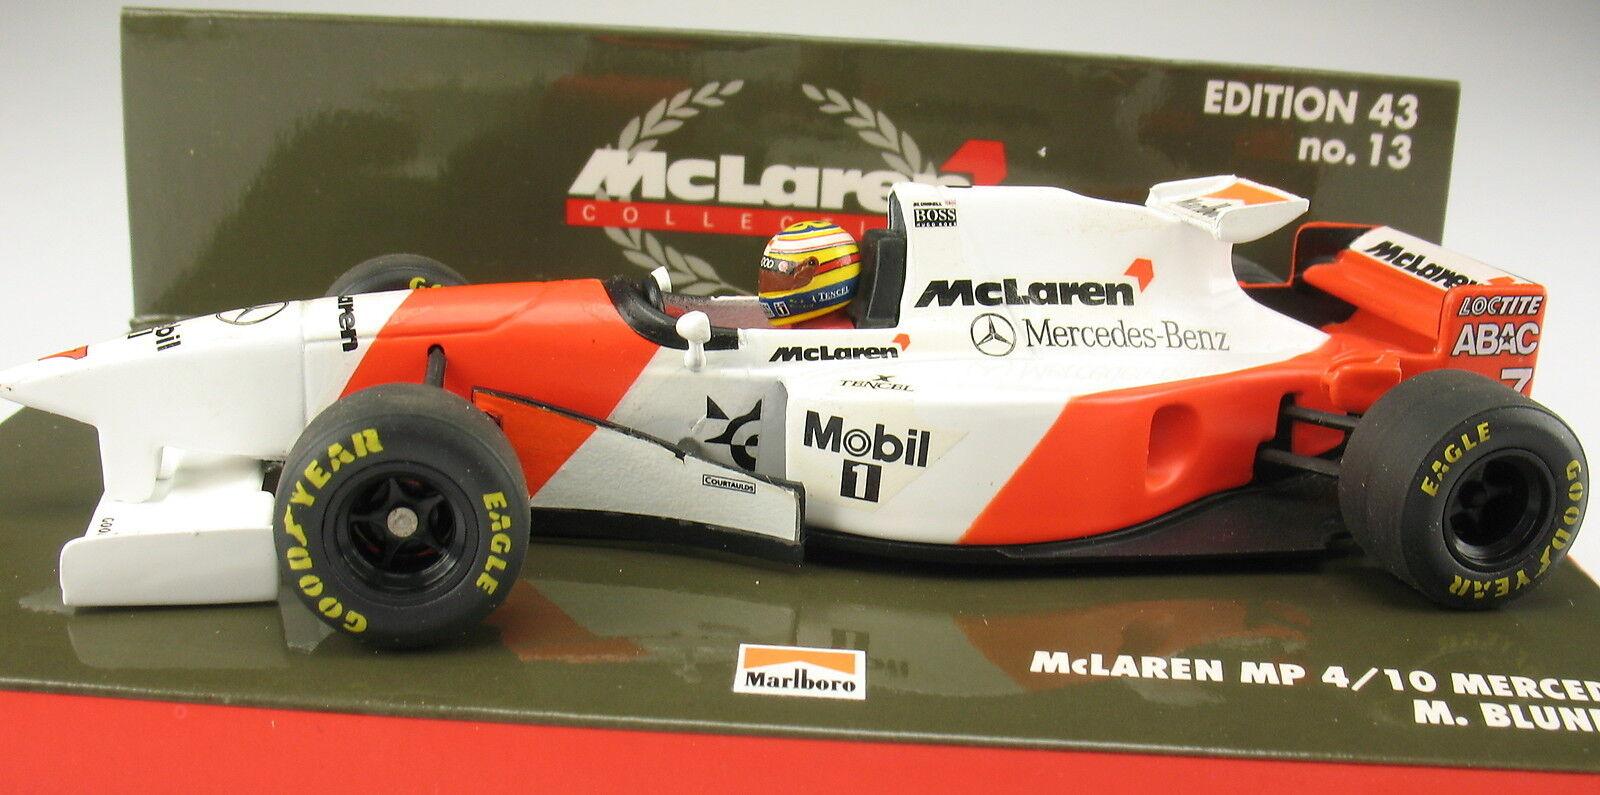 Minichamps-f1 McLaren Mercedes MP 4-10 - M bleundell-MARLBor - 1 43 No. 13